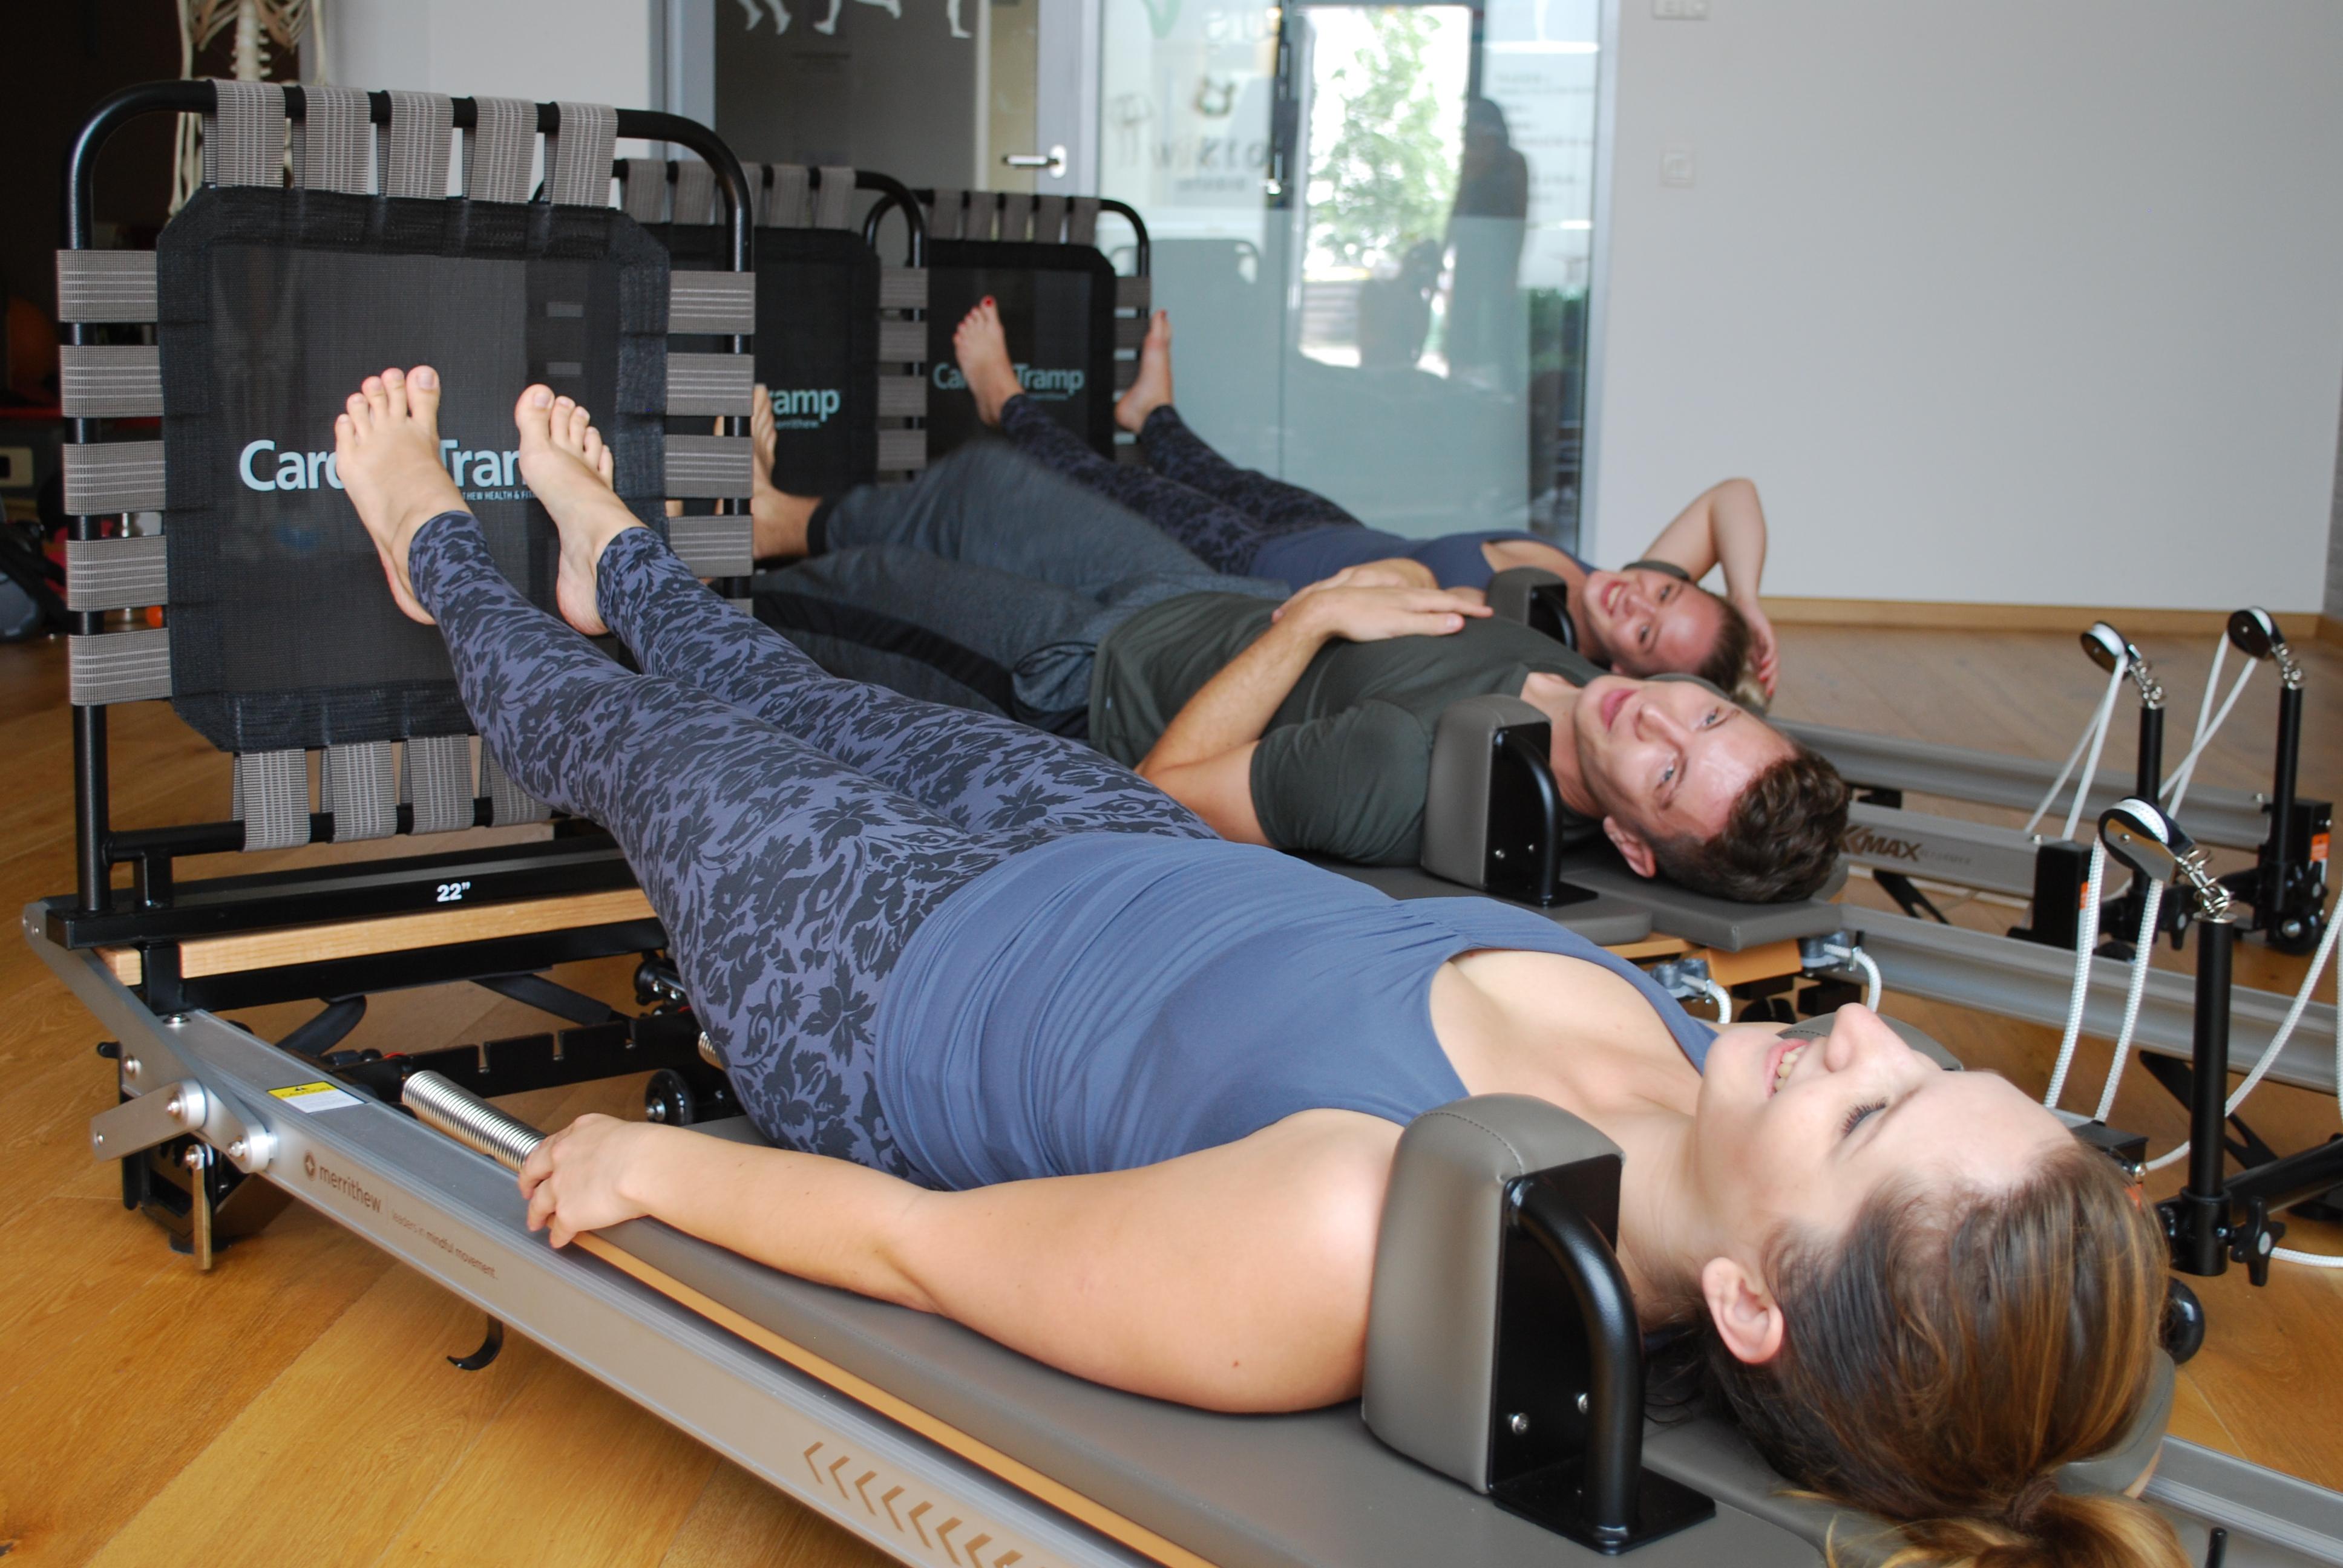 pilates-reformer-cardio-tramp-1